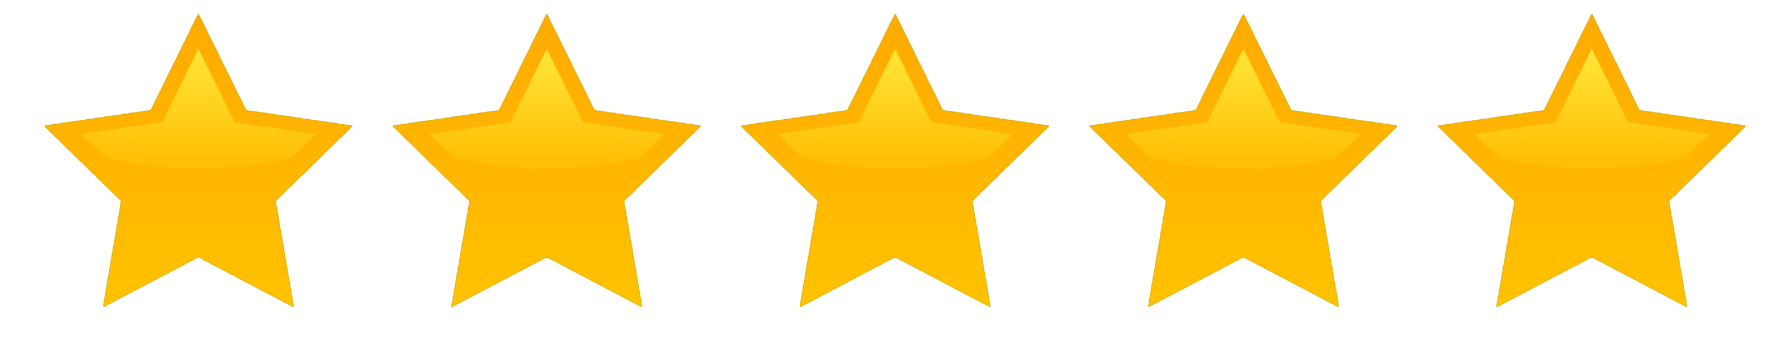 5 star tempolate